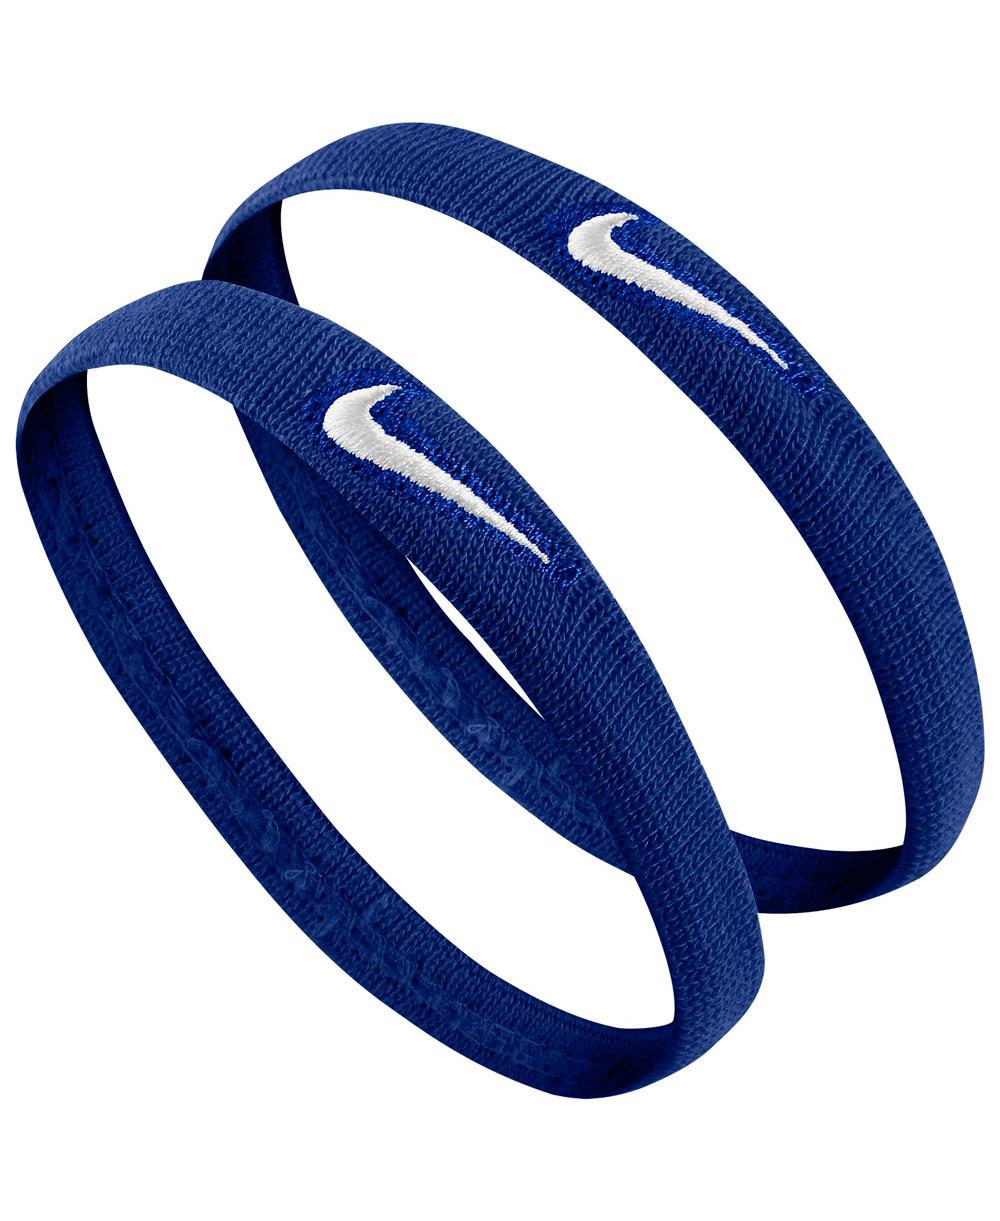 Dri-FIT Skinny Bicep Bands Blue